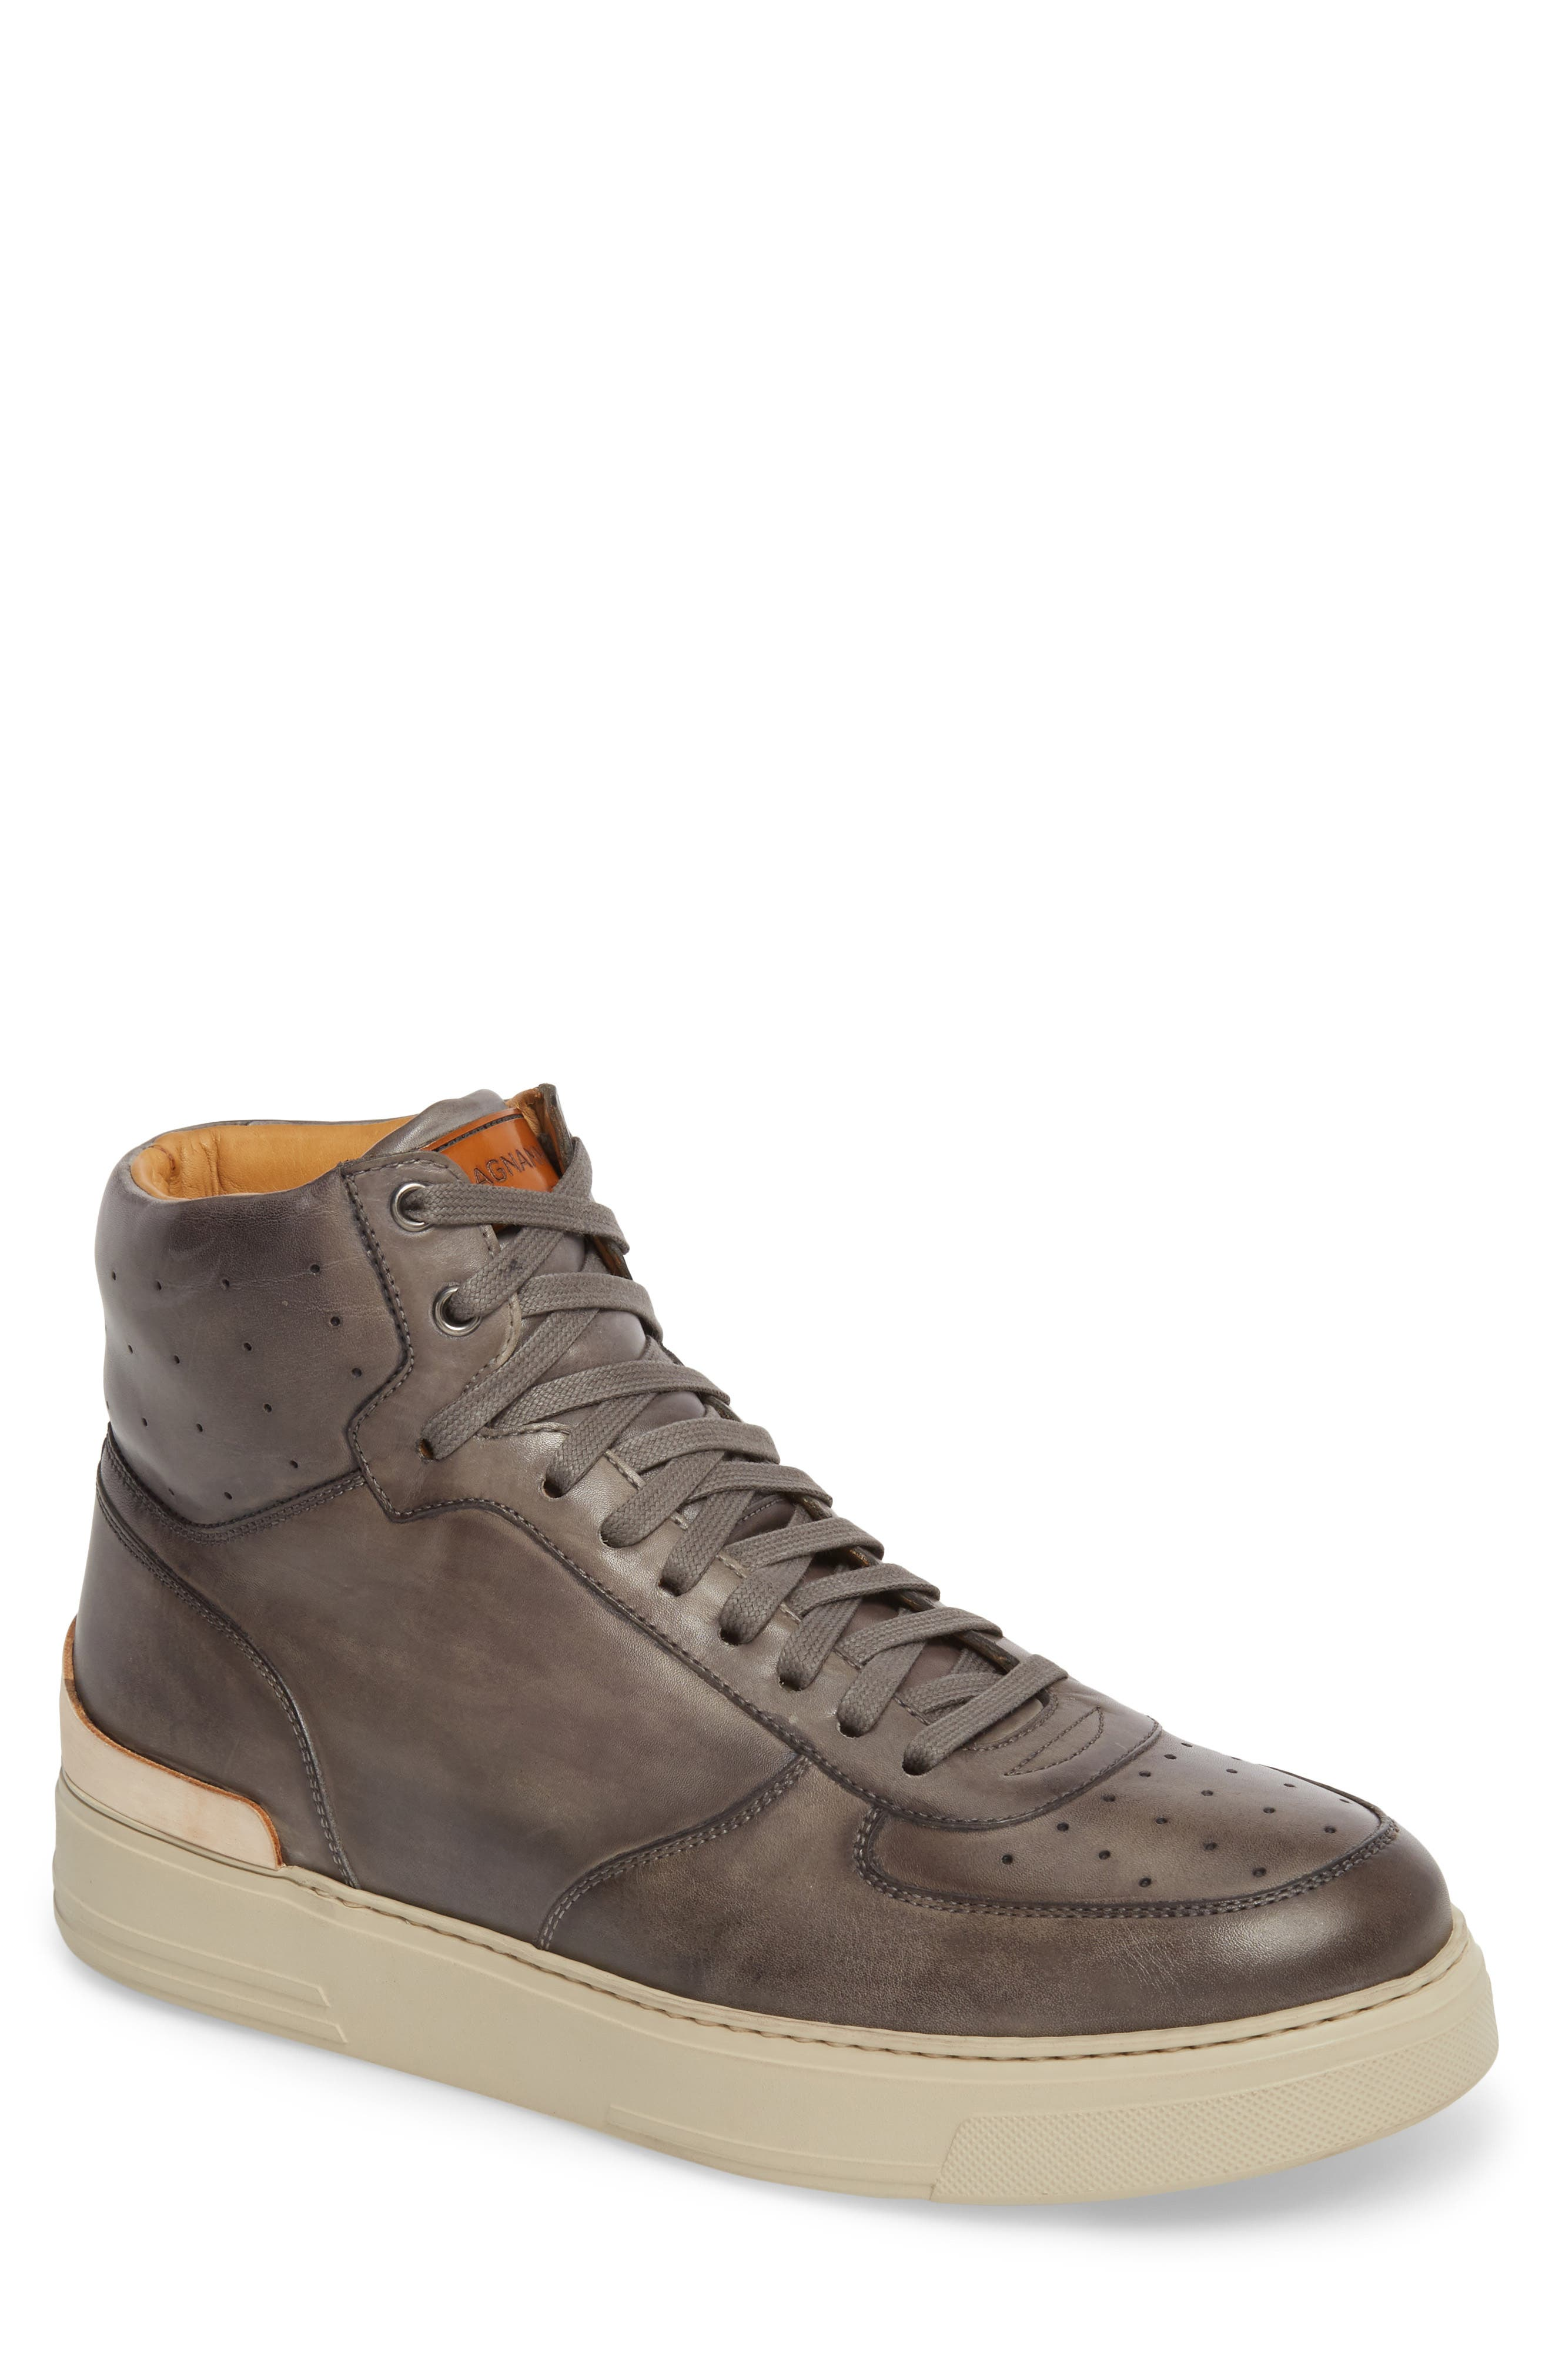 Varro Hi Top Lace Up Sneaker,                         Main,                         color, Grey/ Grey Leather